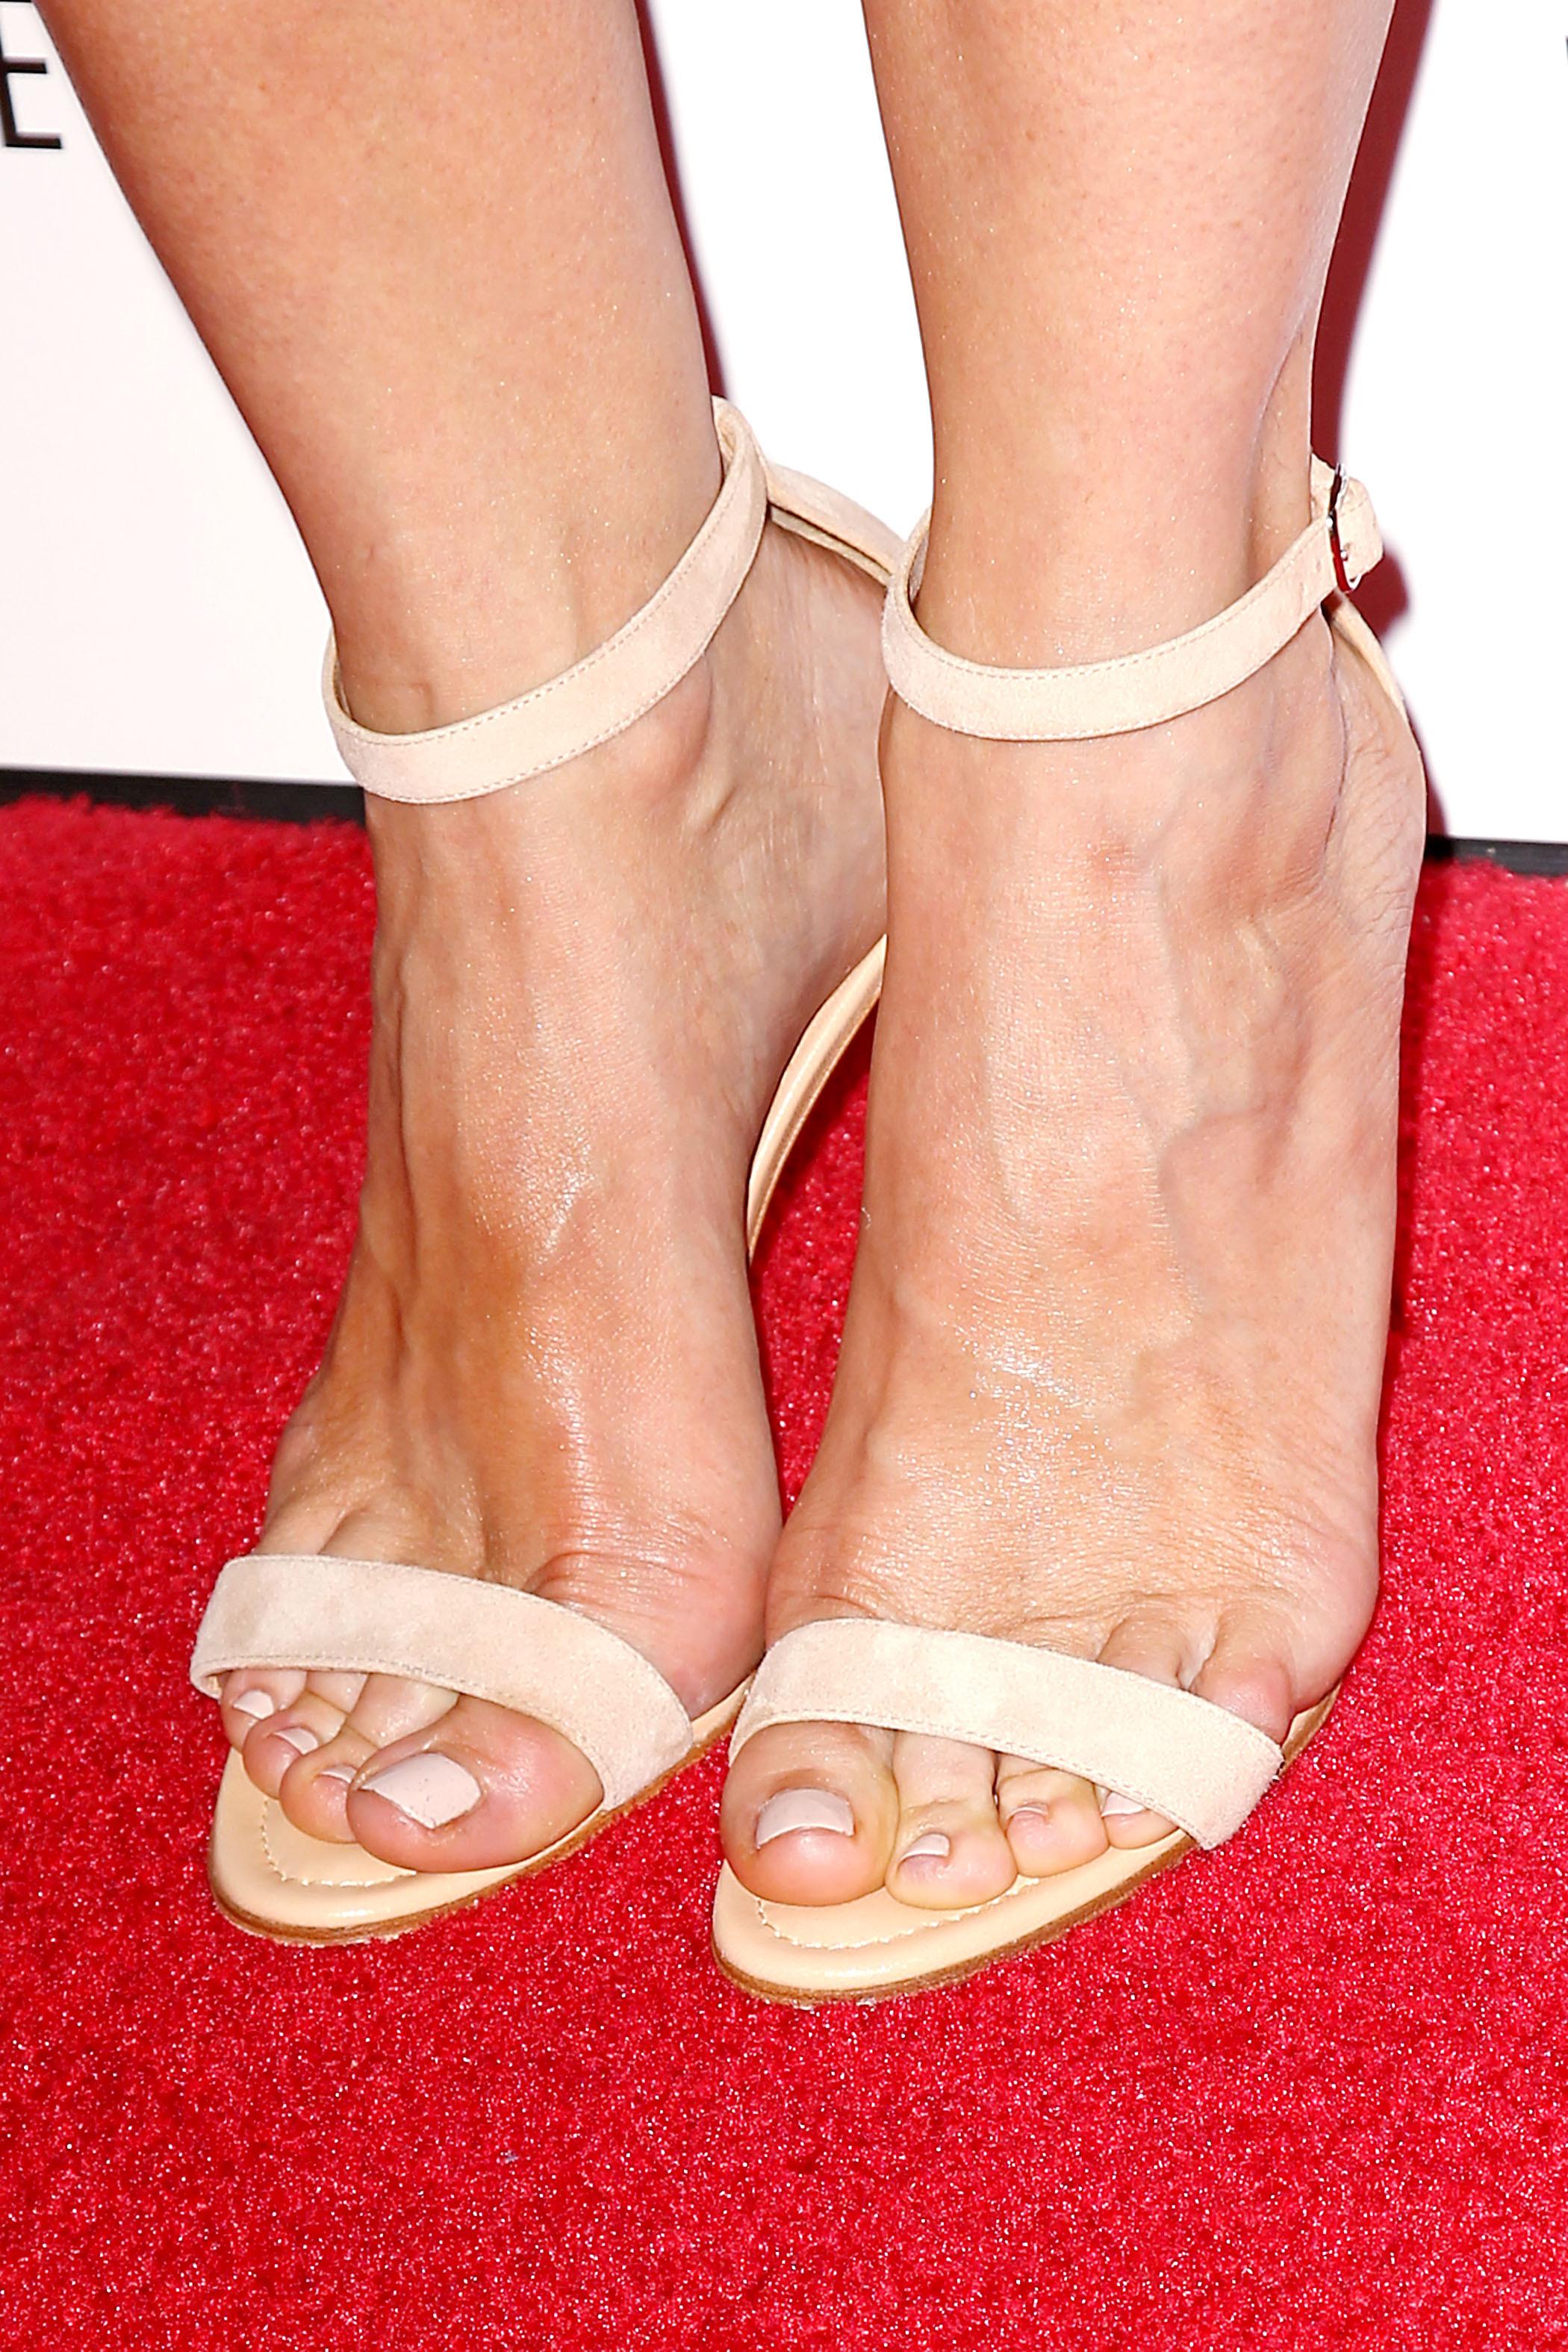 kristen wiig s feet